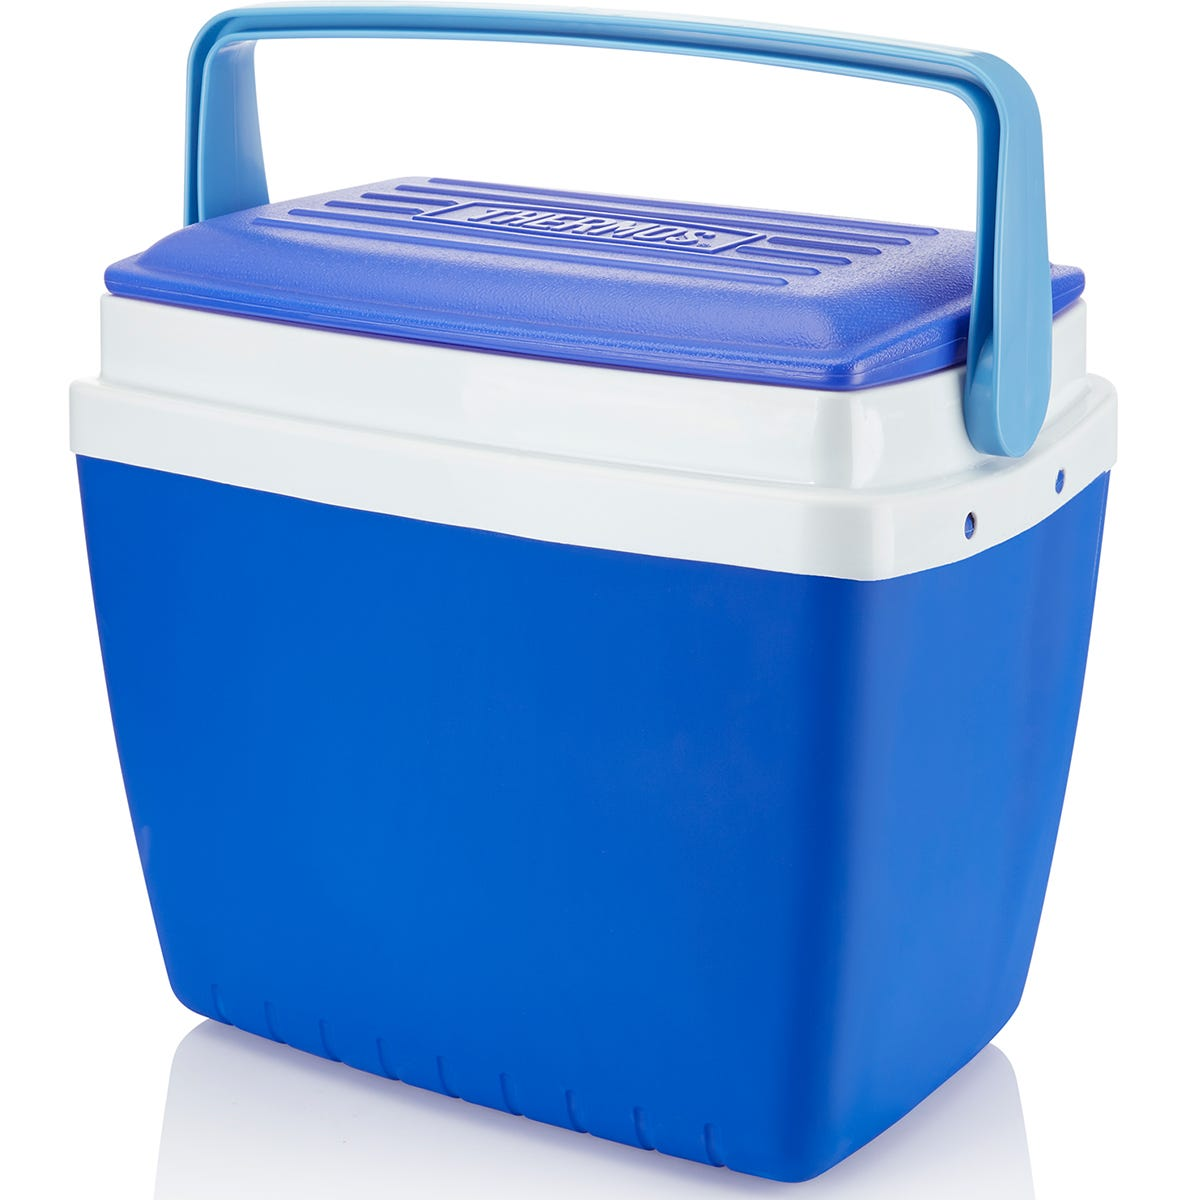 Thermos Cool Box 28 L - Blue